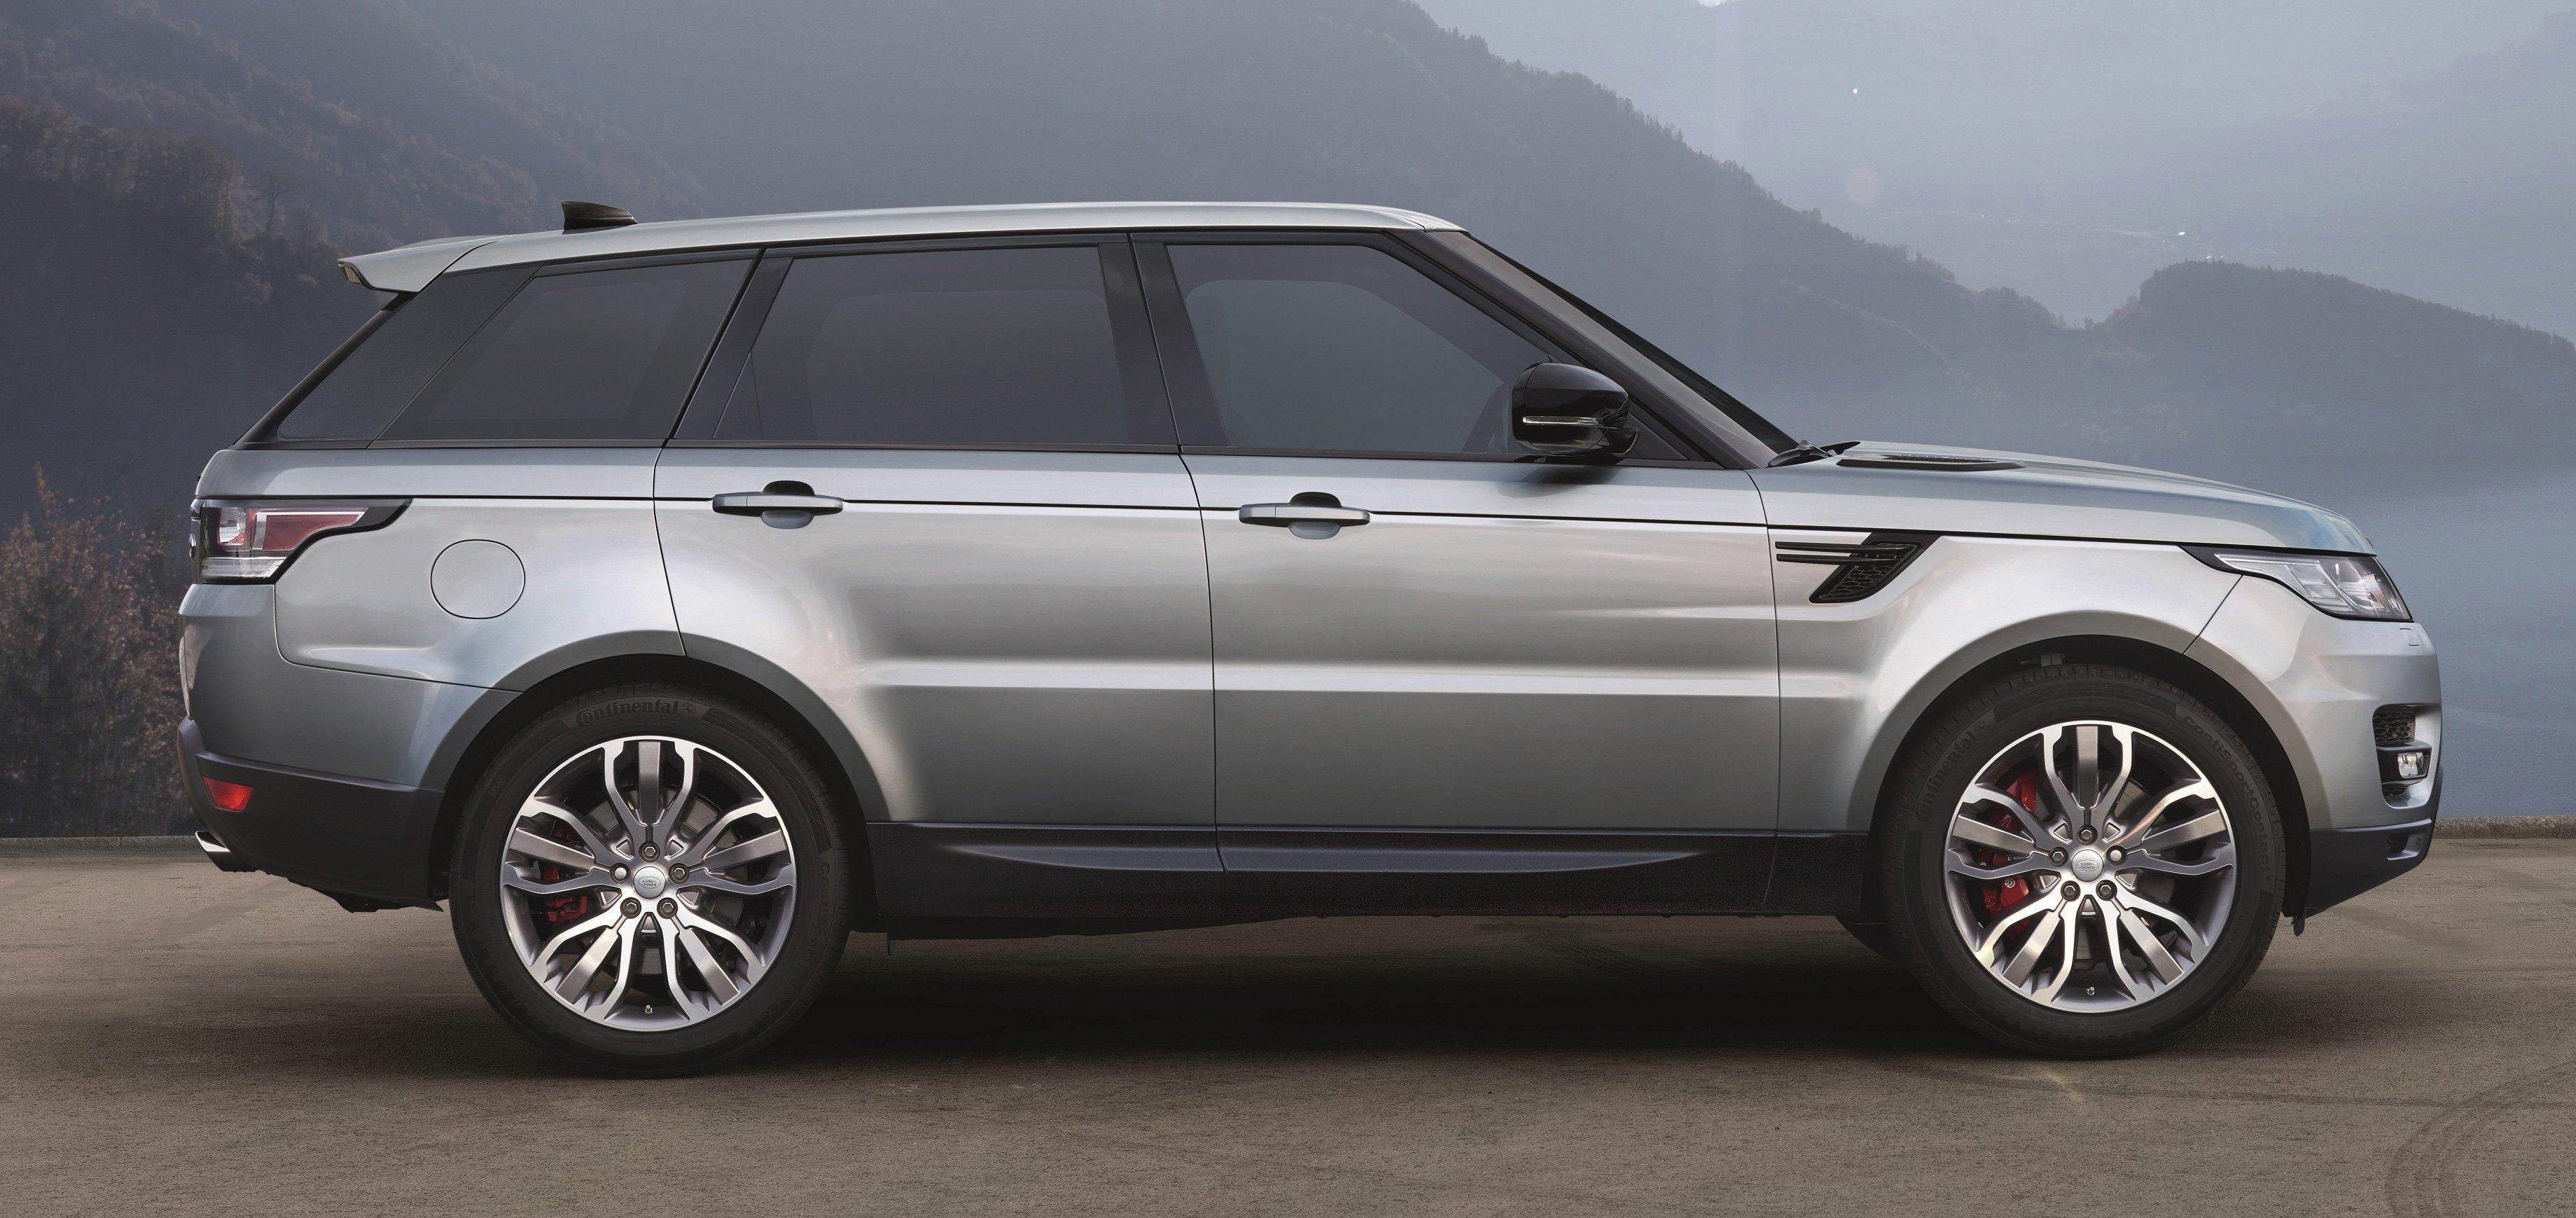 2017 Range Rover Sport Gets 2 0l Twin Turbo Ingenium